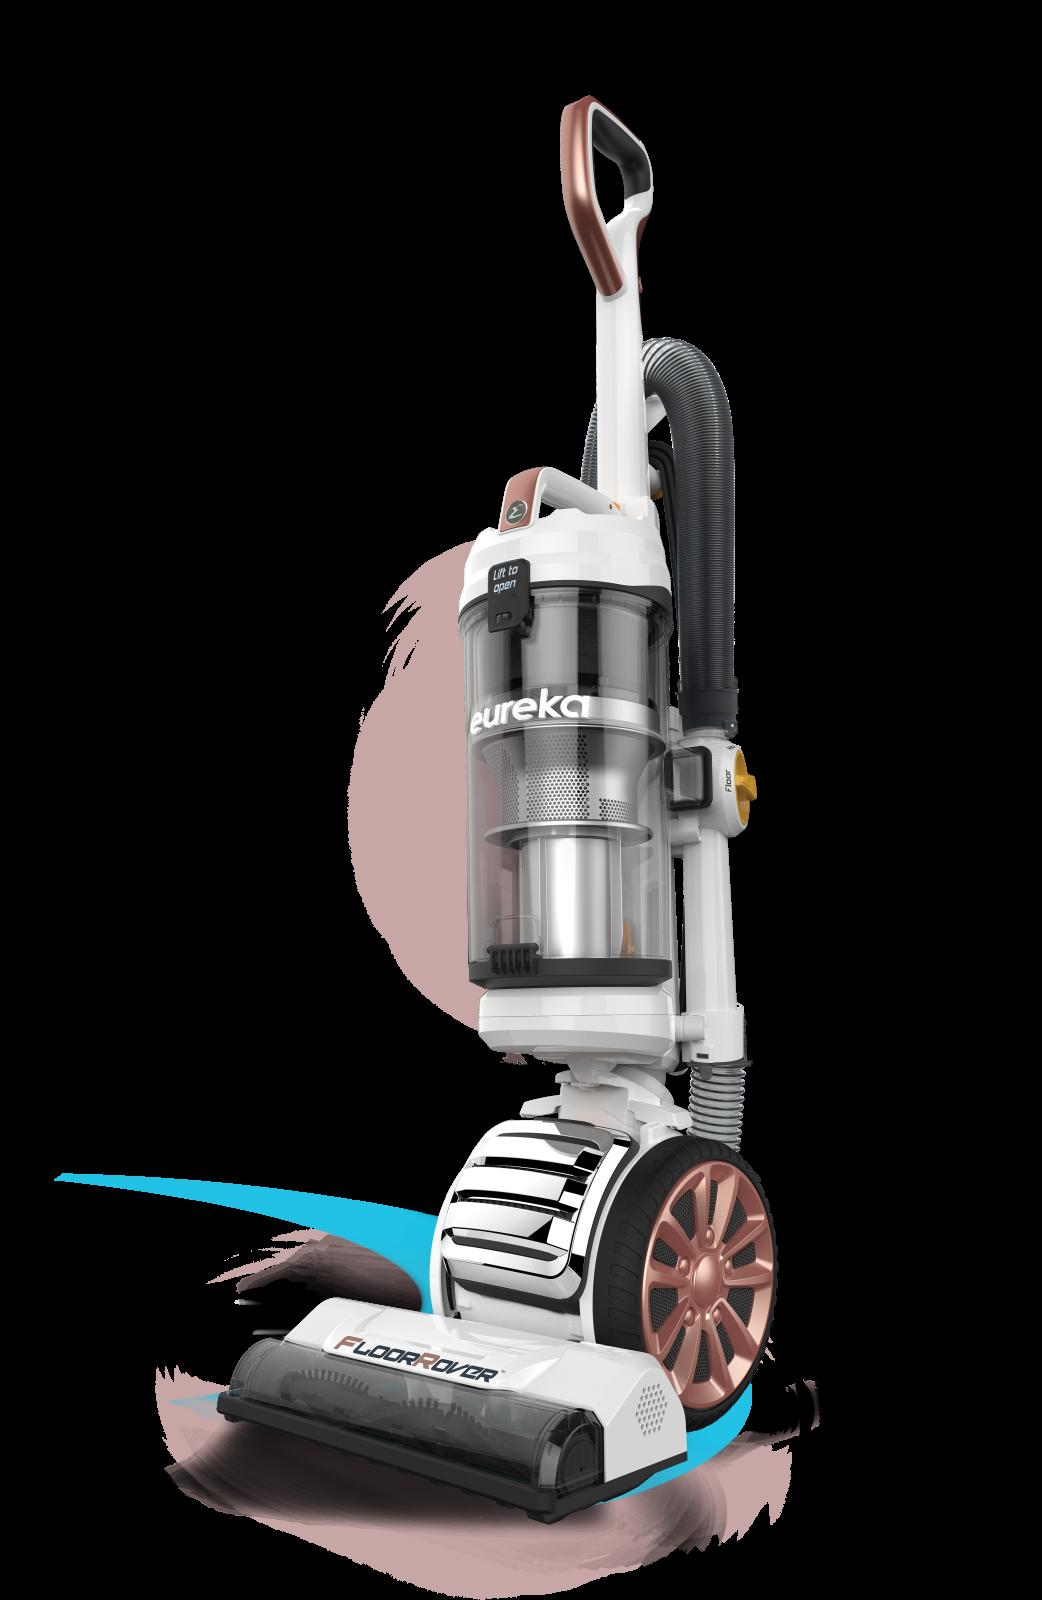 REF270U: Eureka FloorRover Versatile Upright Vacuum (NEU560), Renewed